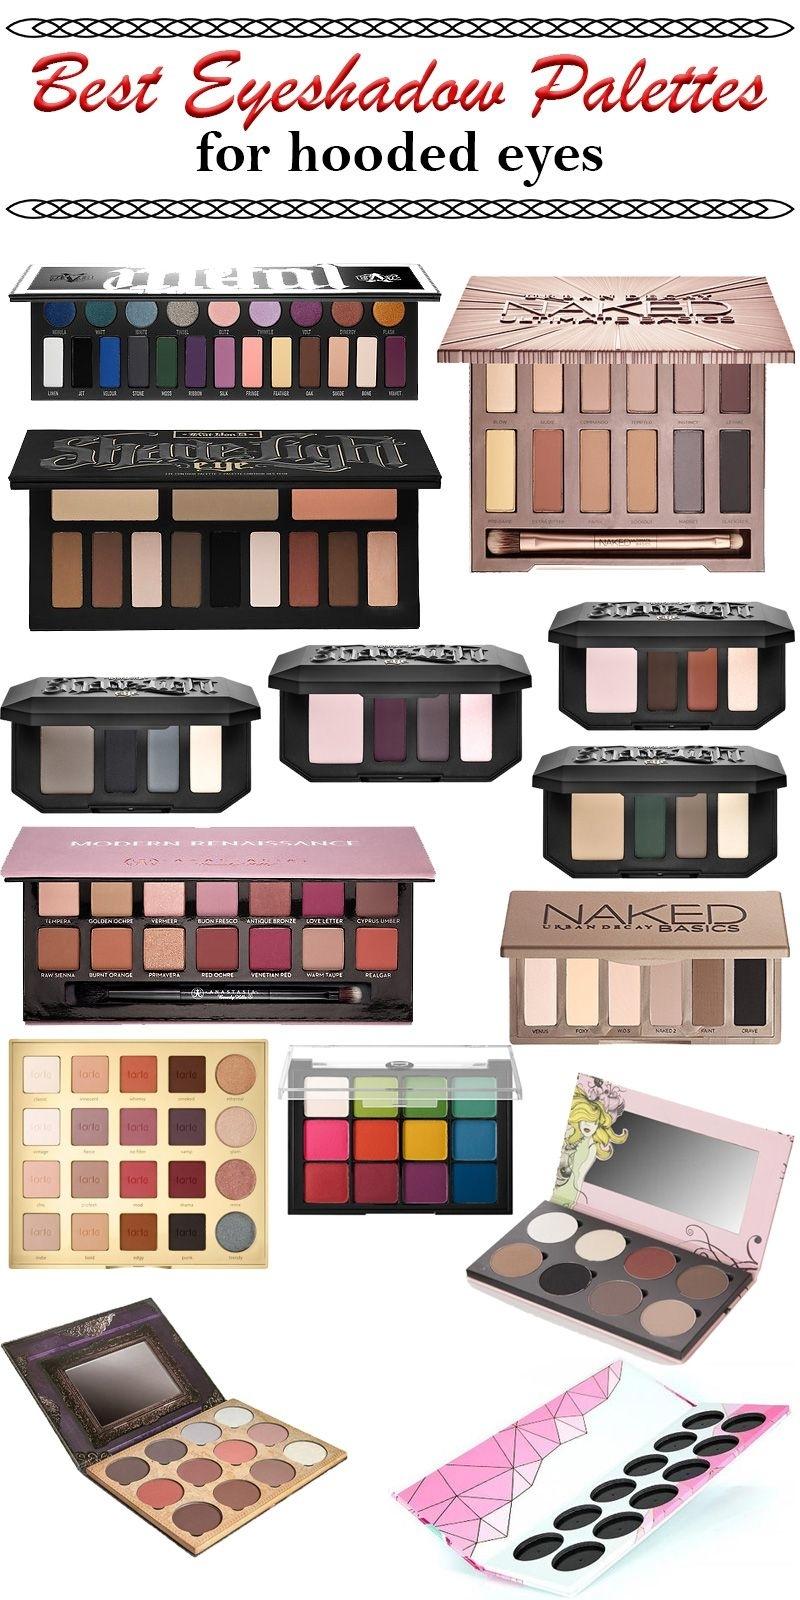 Best Eyeshadow Palettes For Hooded Eyes | Phyrra - Cruelty Free for Best Eyeshadow Palettes For Hazel Green Eyes